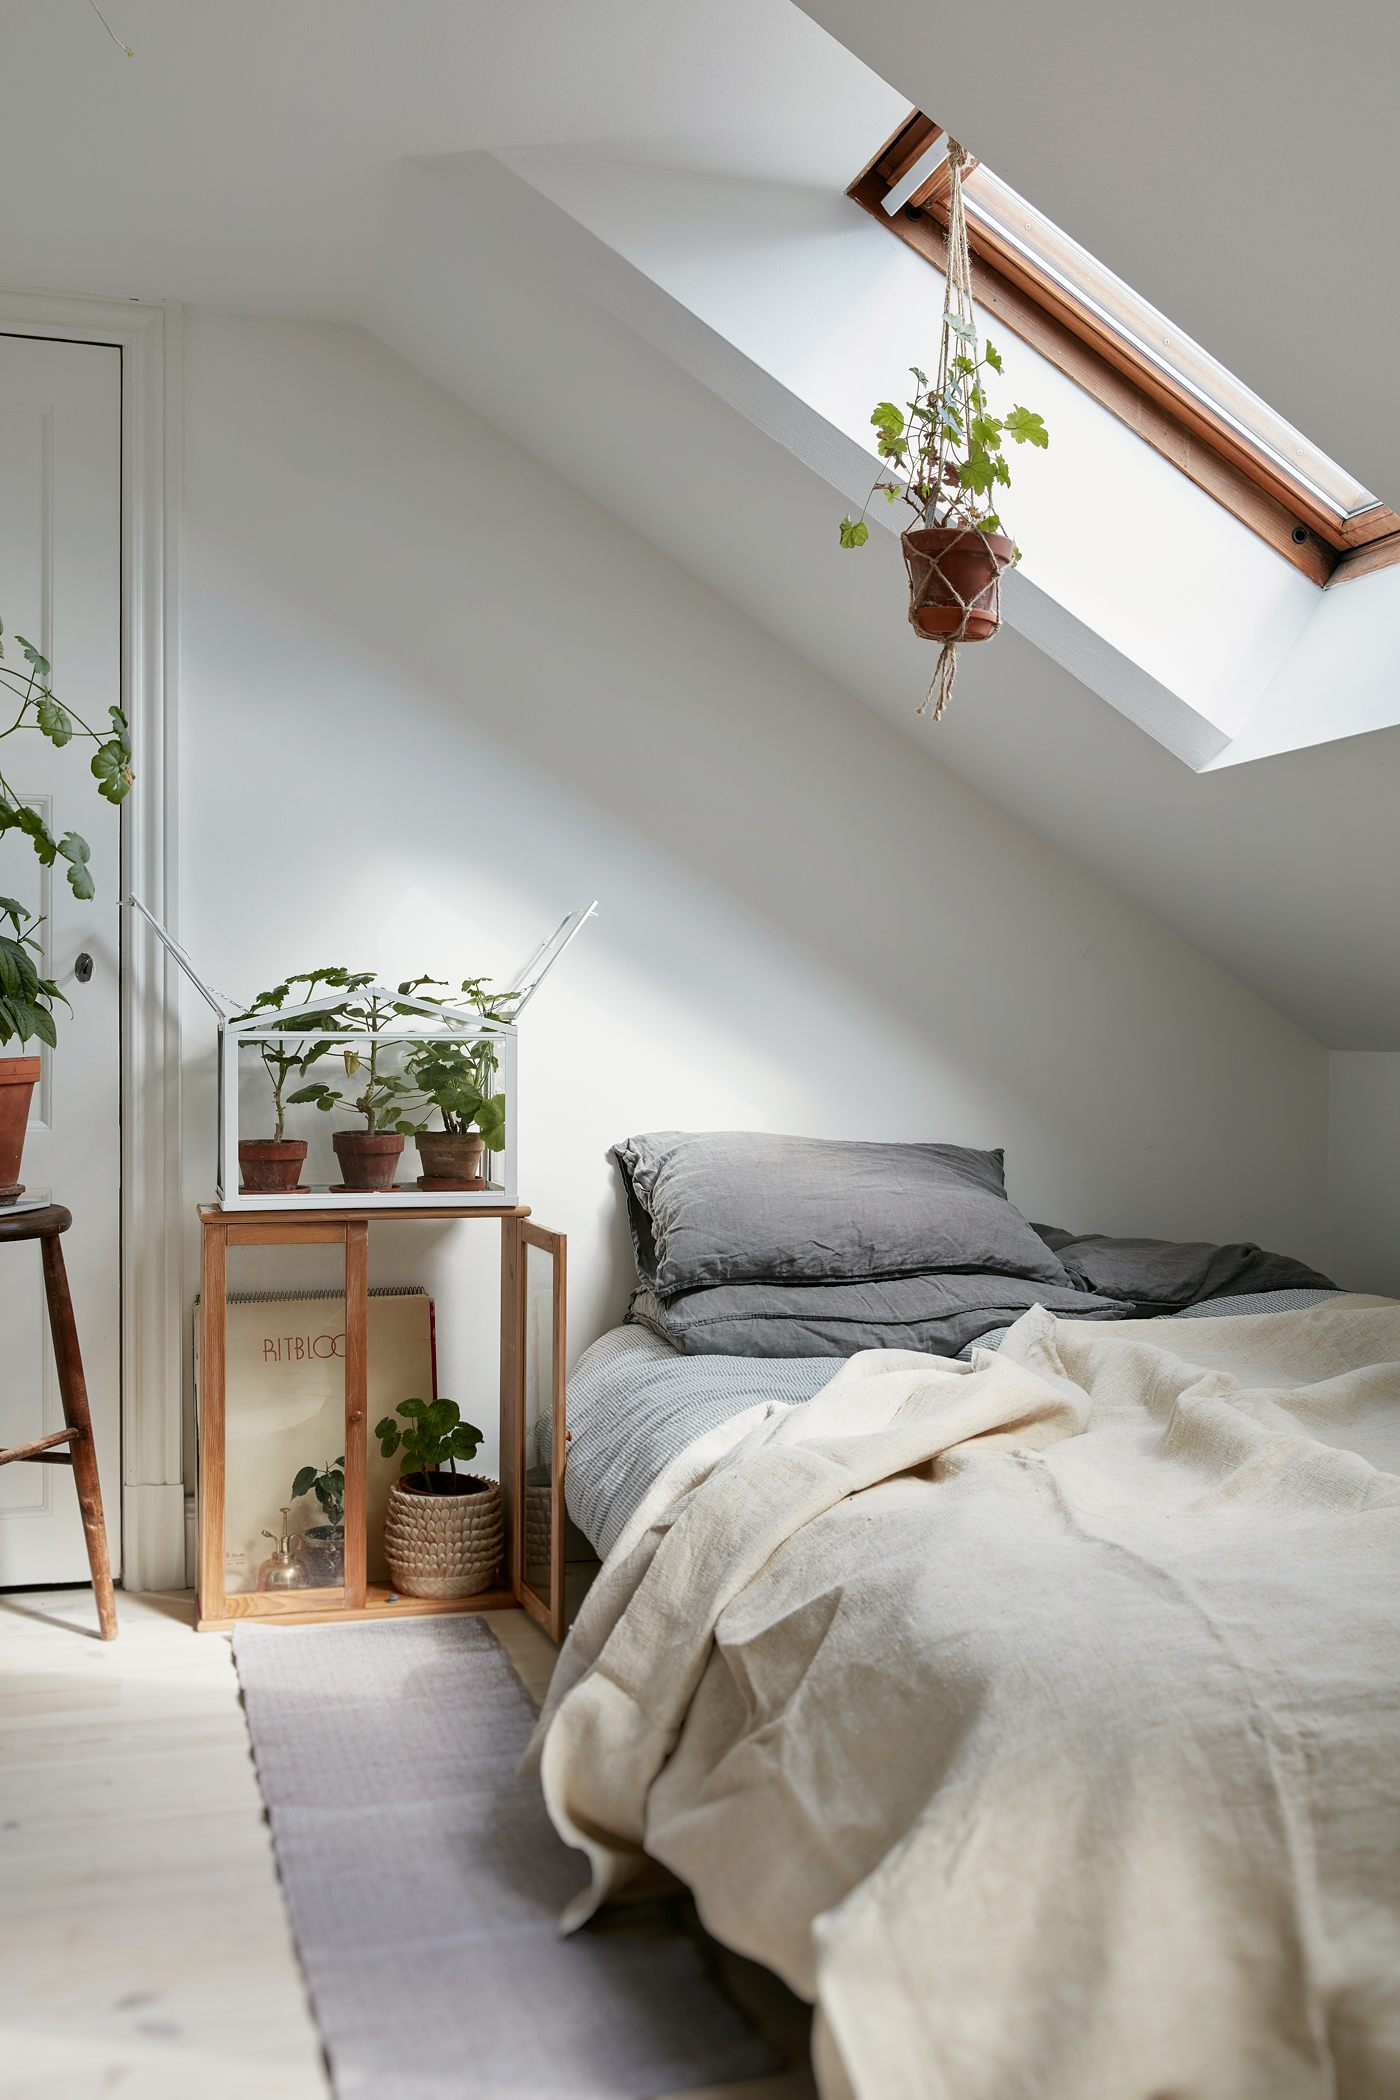 40 Minimalist Bedroom Ideas | Less is More | Homelovr on Minimalist Bedroom Ideas  id=27975